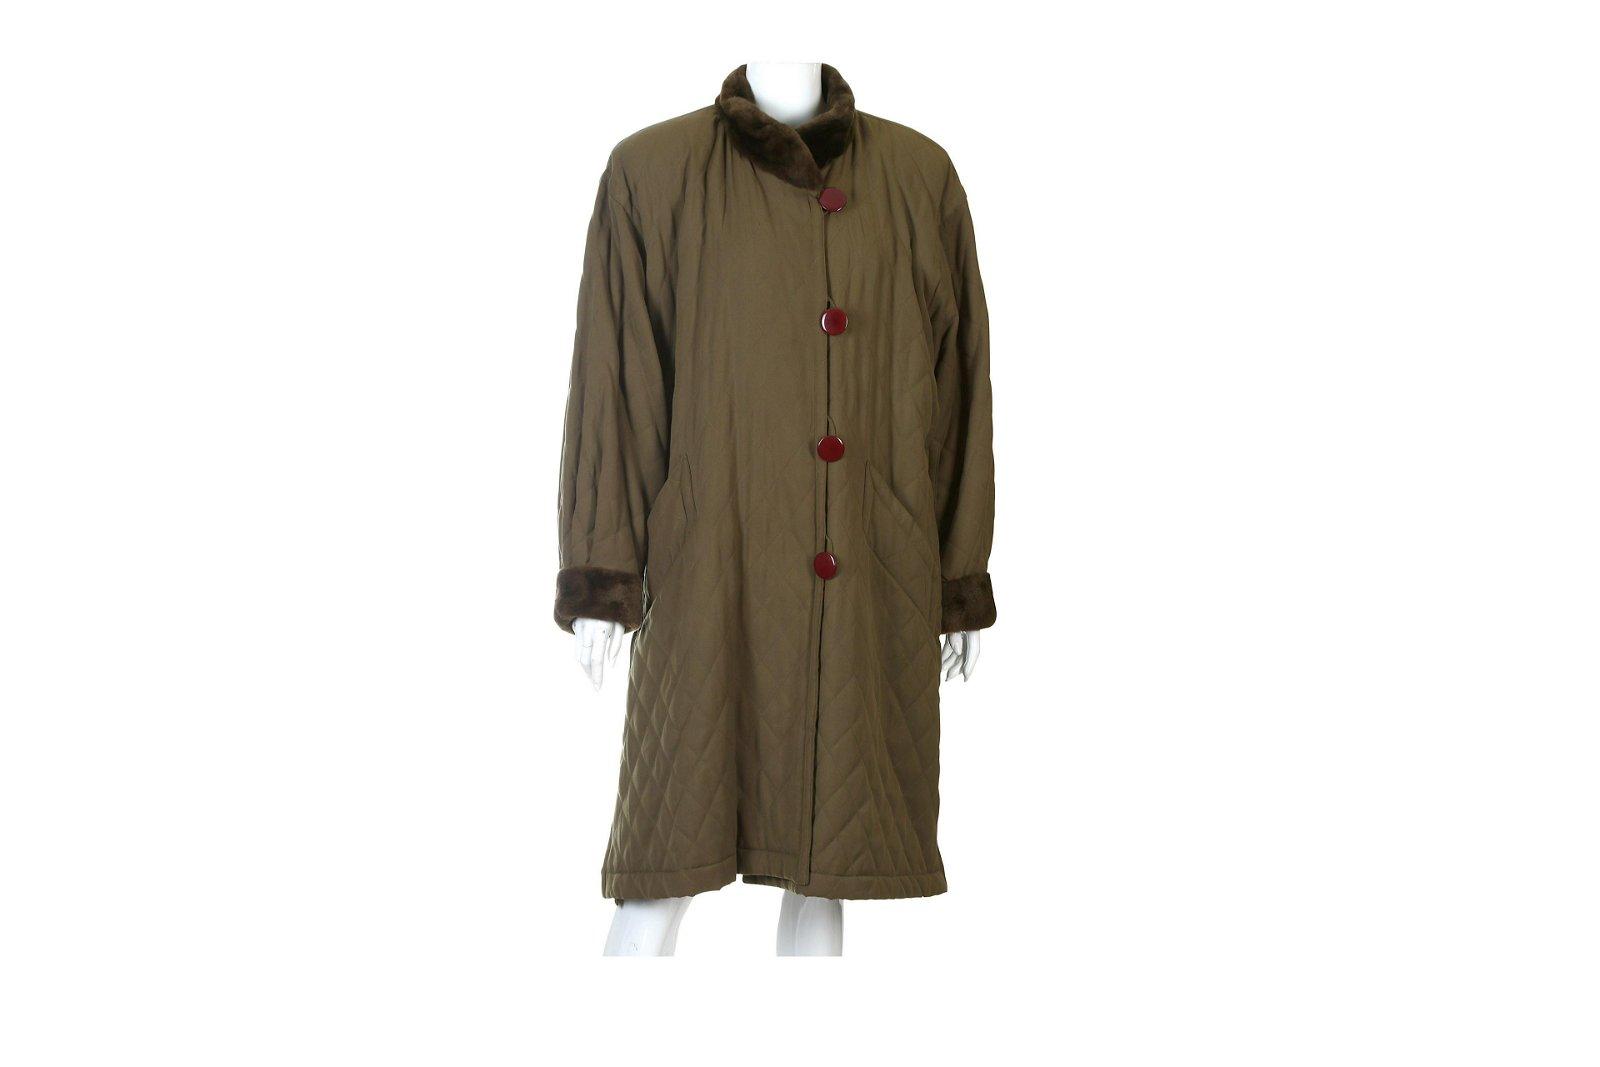 Yves Saint Laurent Khaki Coat